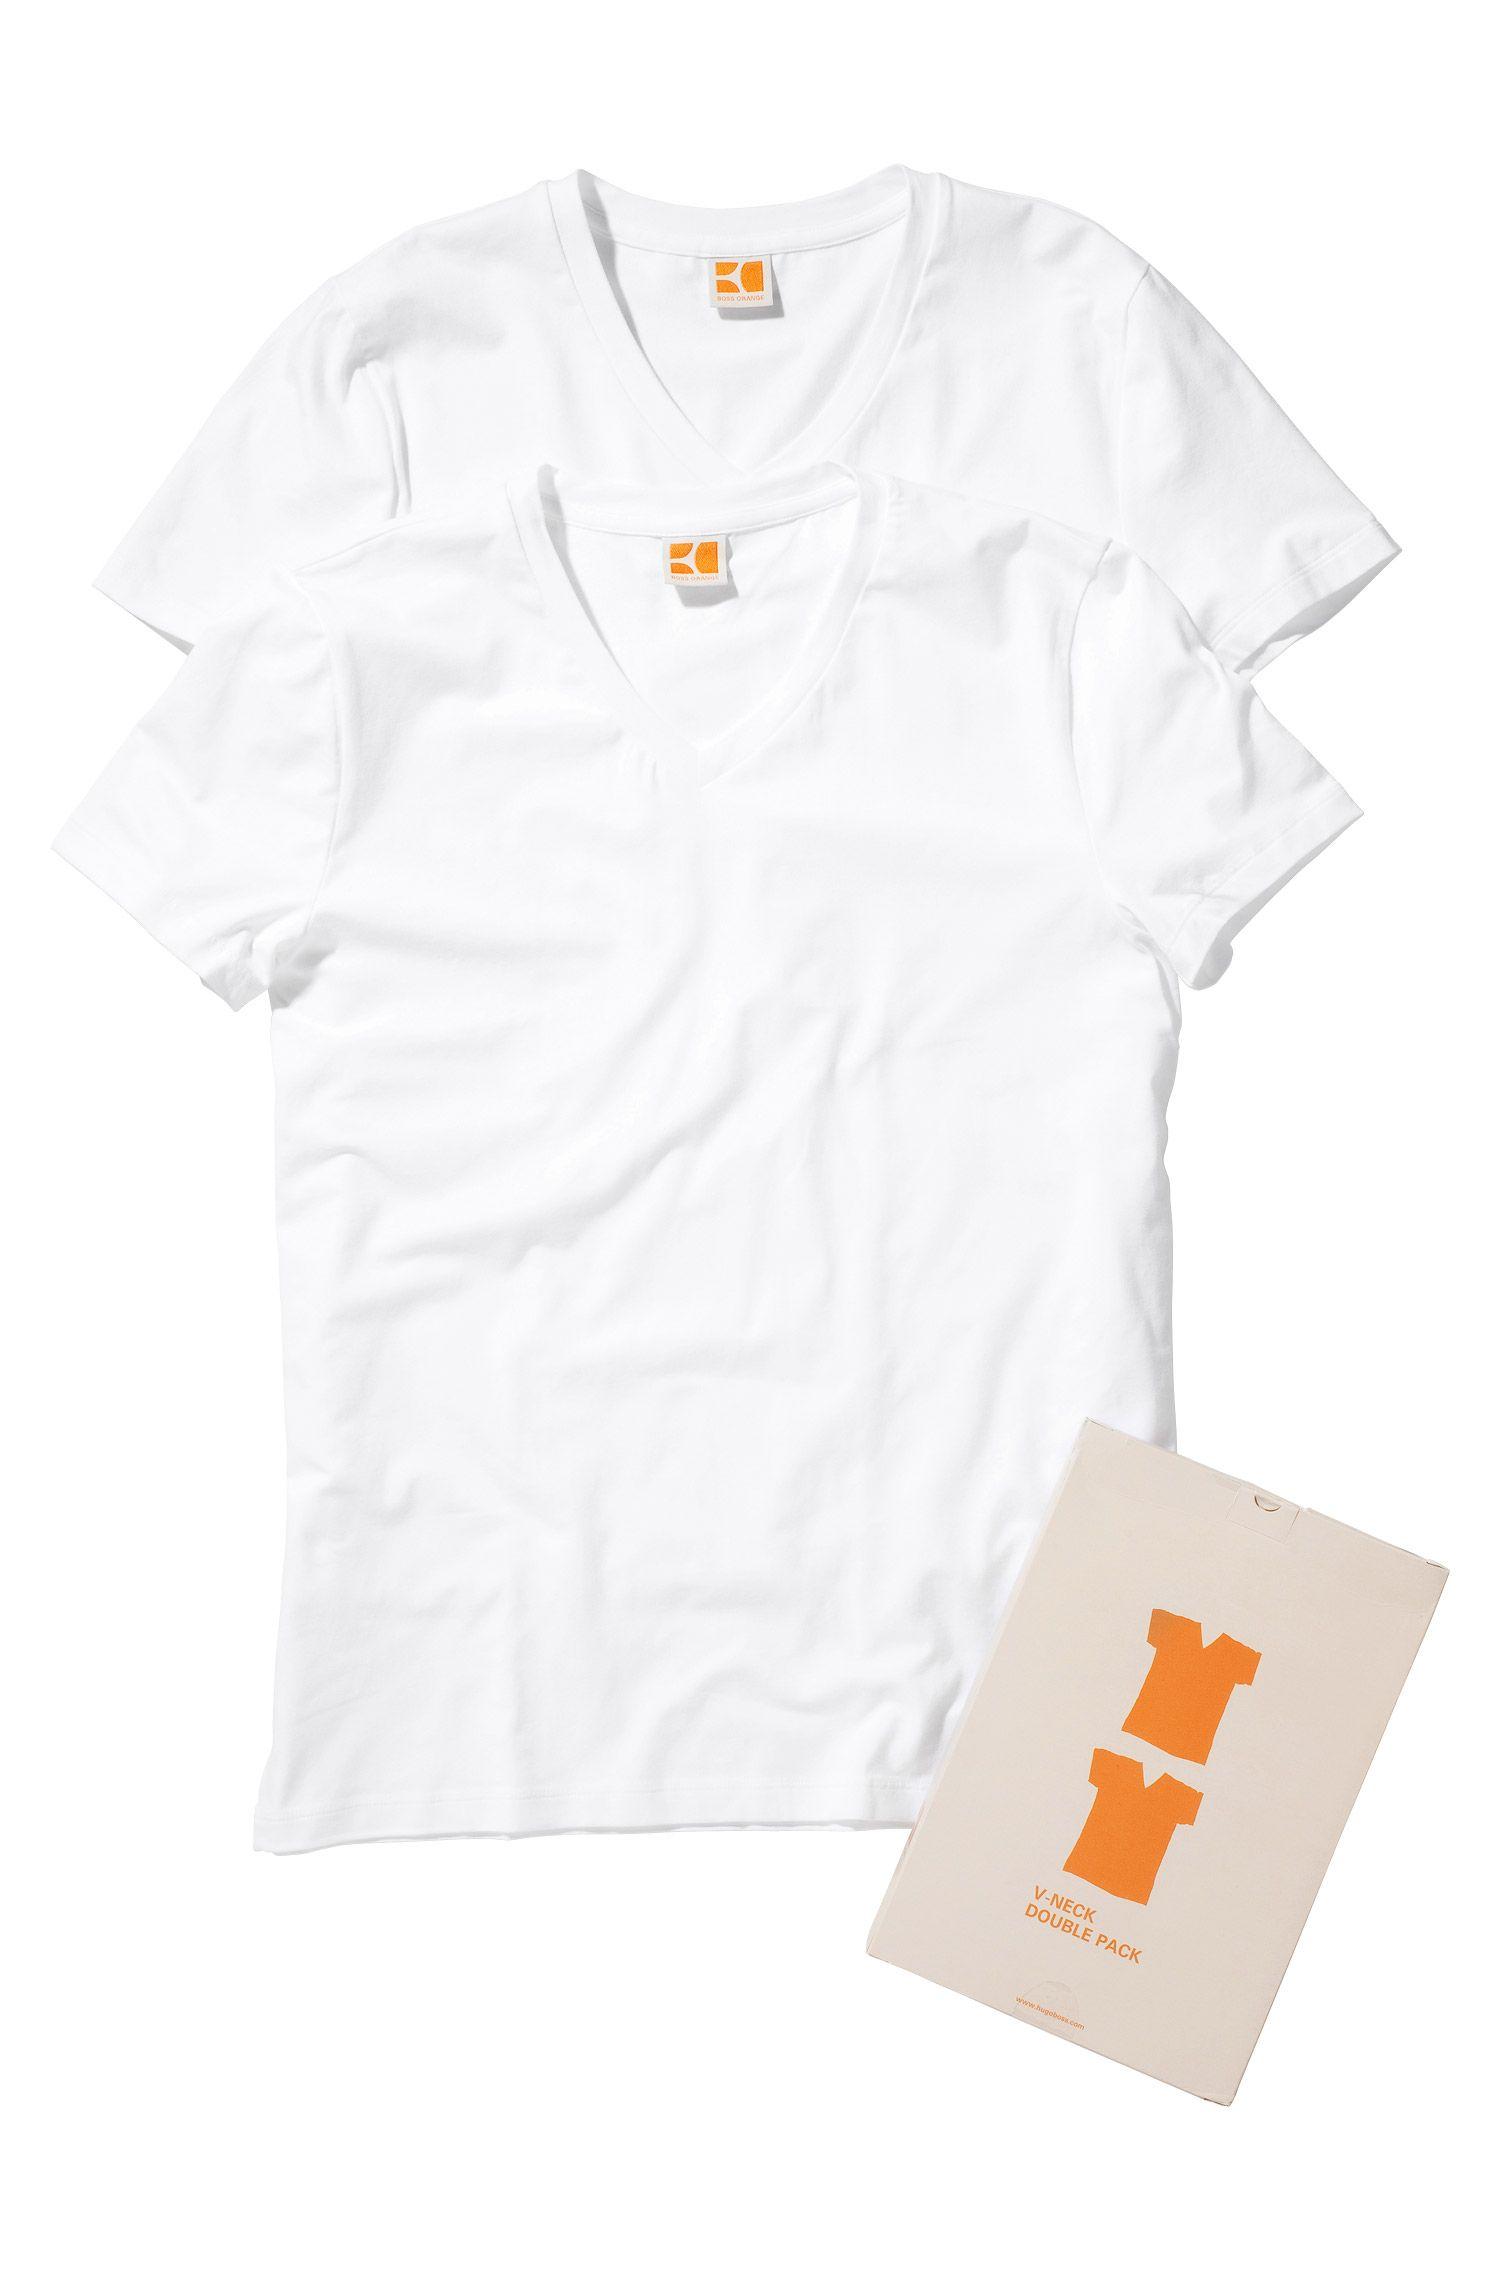 Lot de deux t-shirts, Tyll